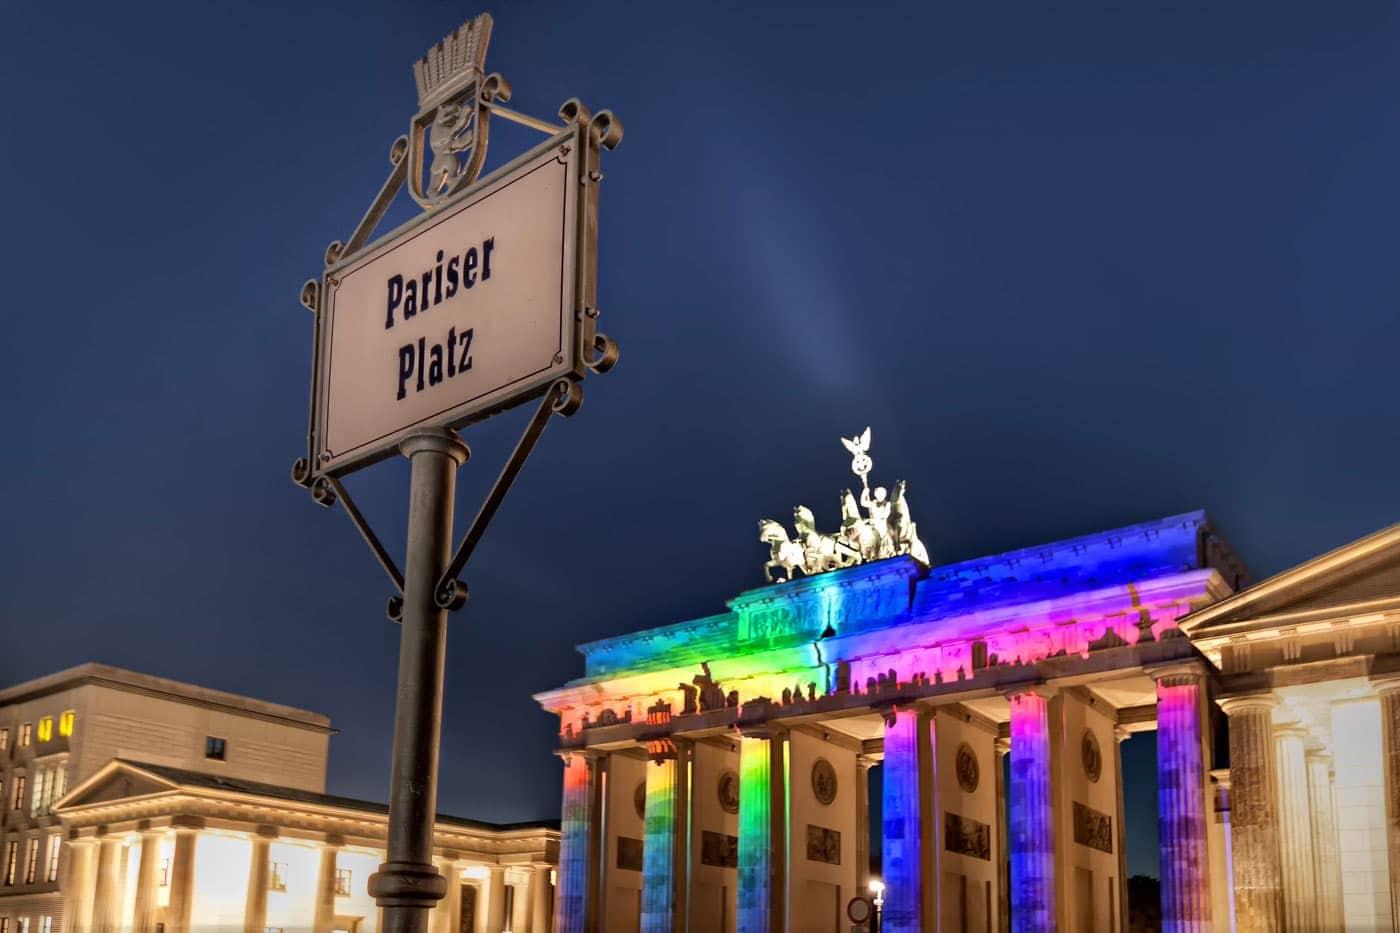 Skyline at the Brandenburg Gate | Berlin, Germany